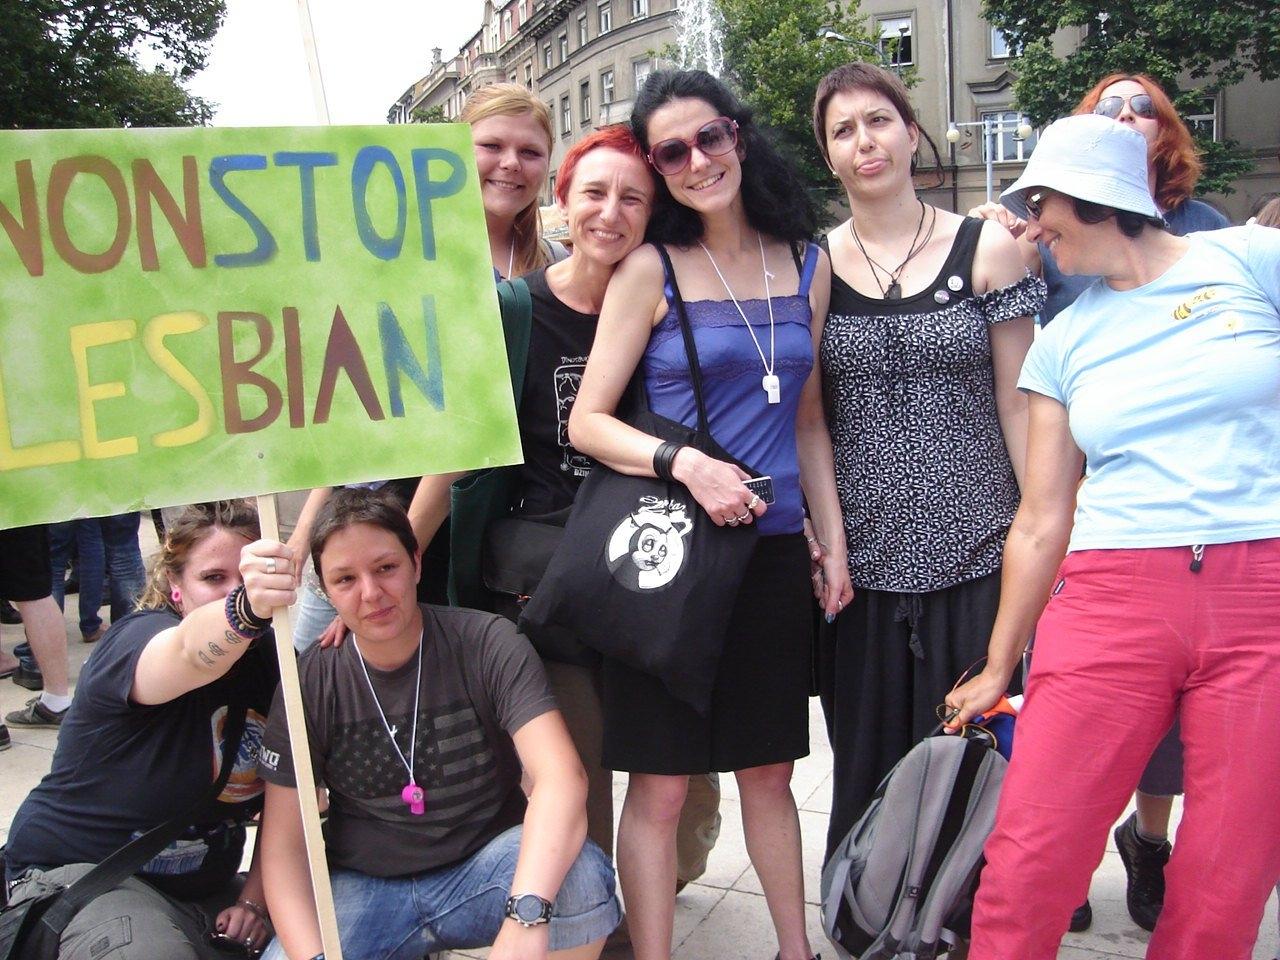 croatia adriatic gay rights activism in new york